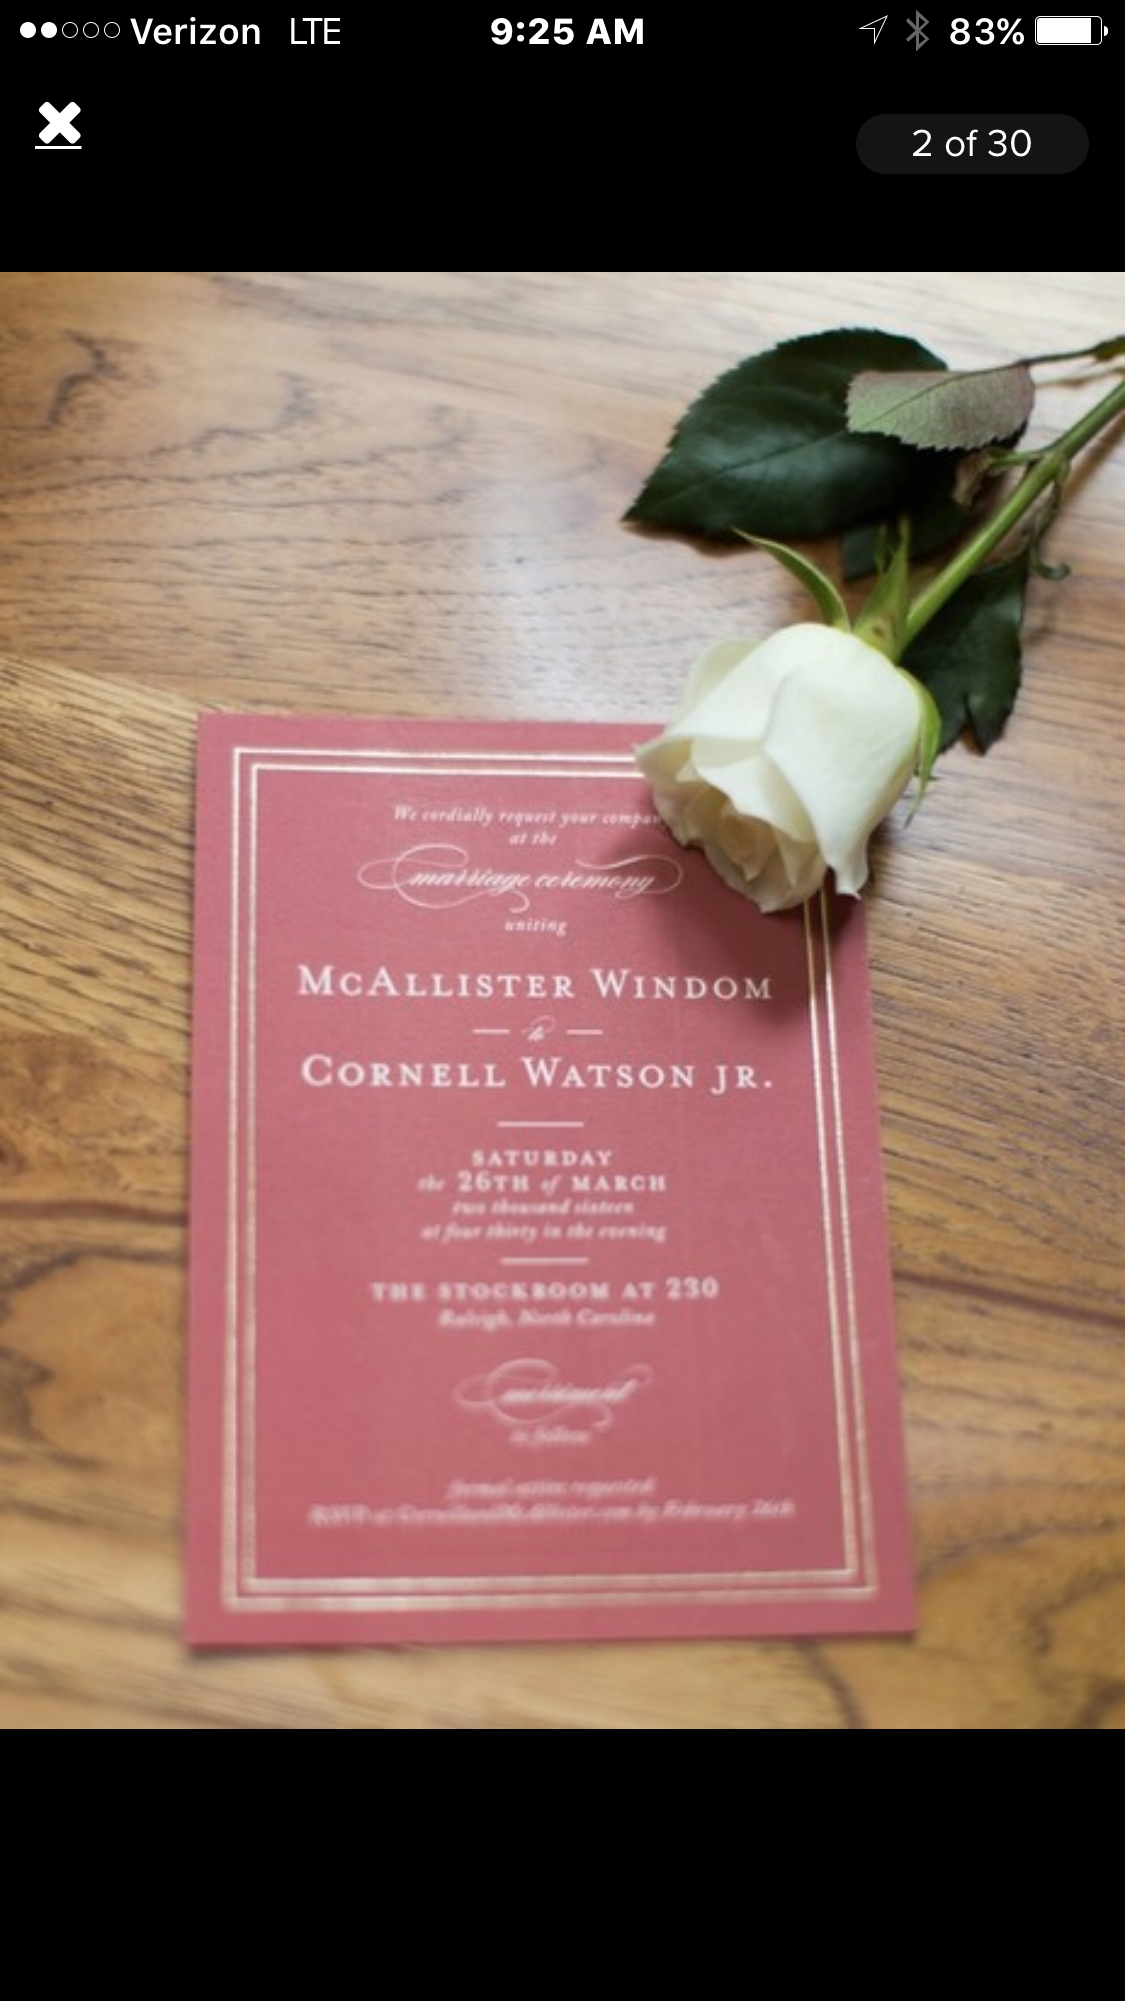 Pin by Bianca Bailey on Wedding Photo Shots | Pinterest | Weddings